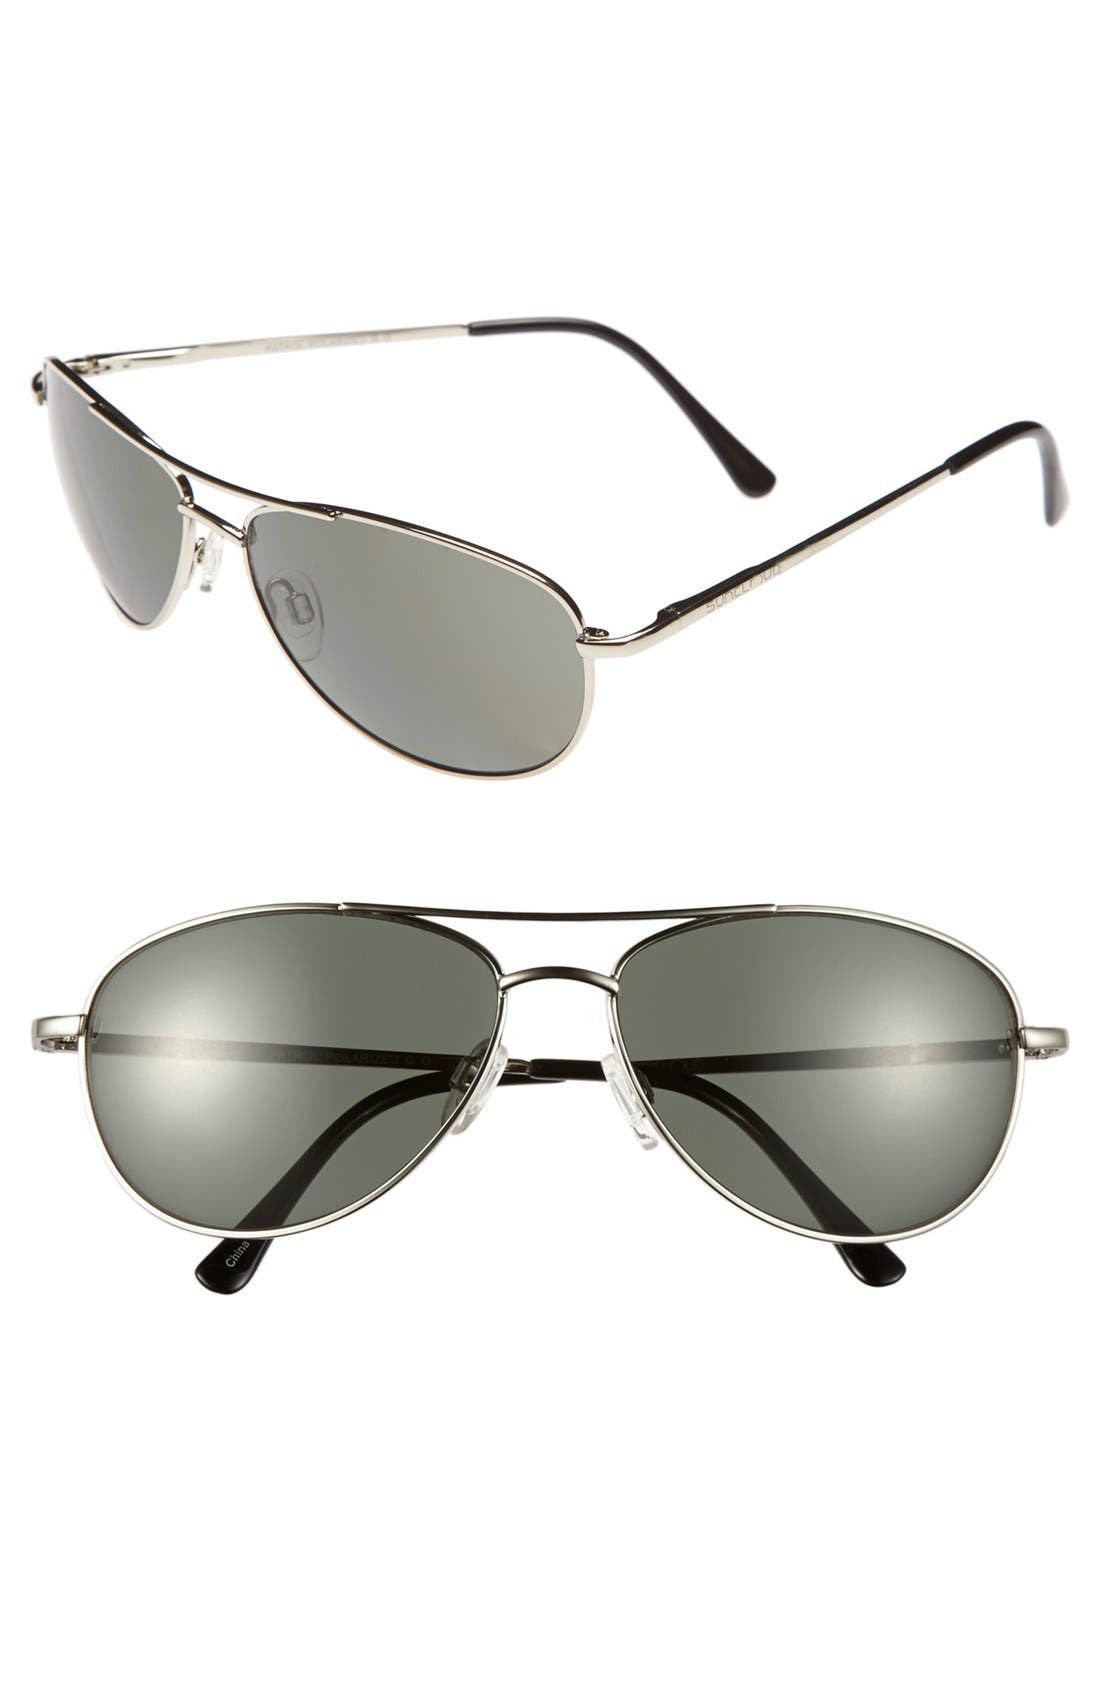 Alternate Image 1 Selected - Suncloud 'Patrol' Polarized Sunglasses